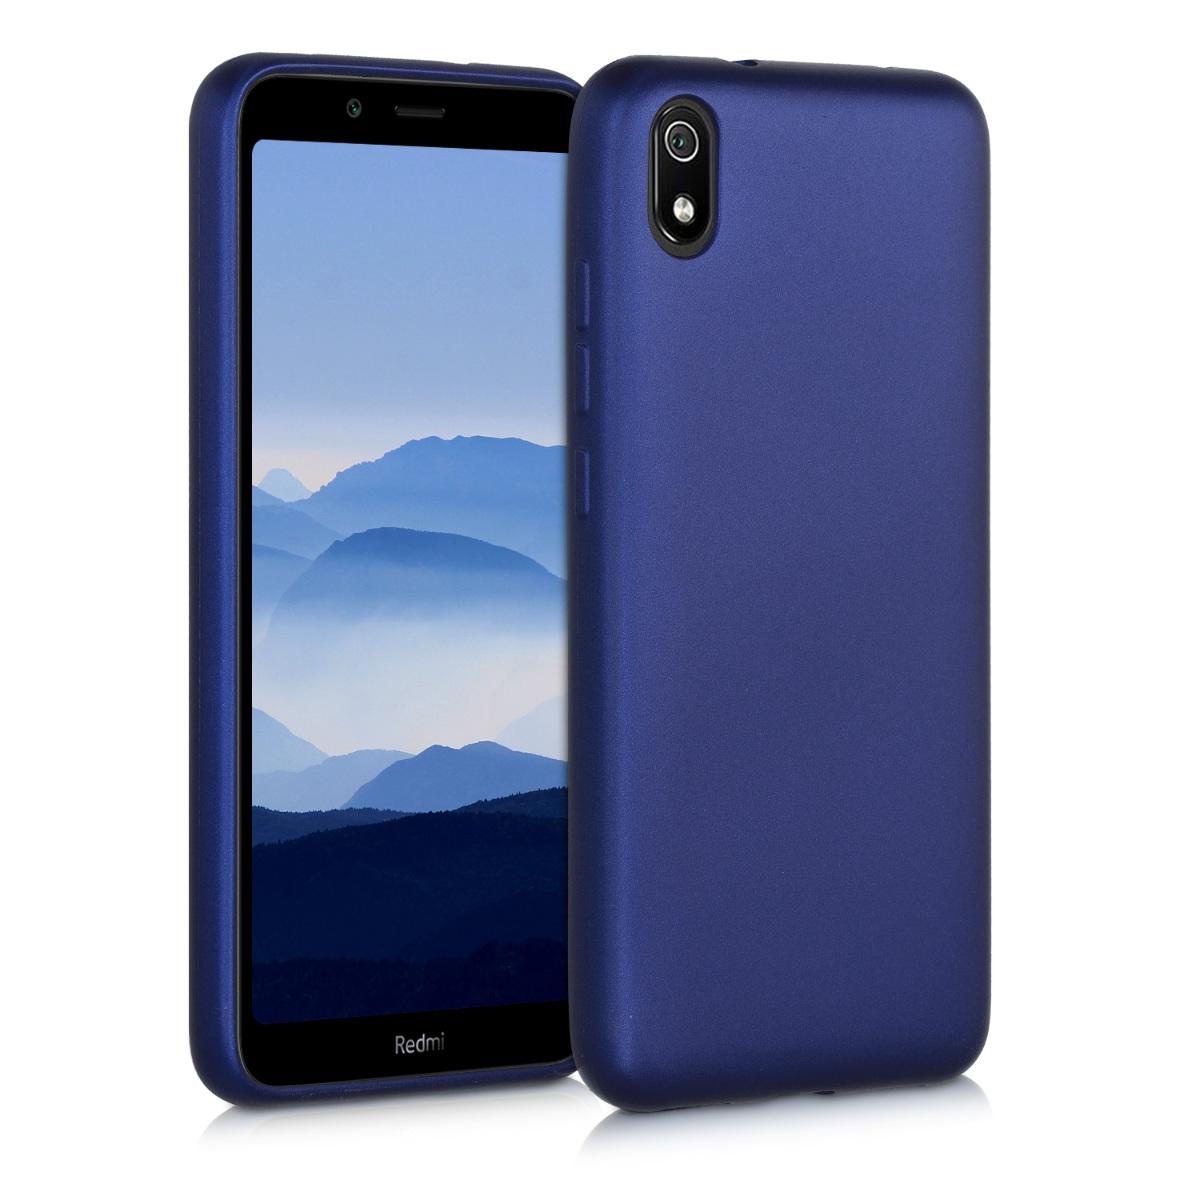 KW Θήκη Σιλικόνης Xiaomi Redmi 7A - Metallic Blue (49233.64)